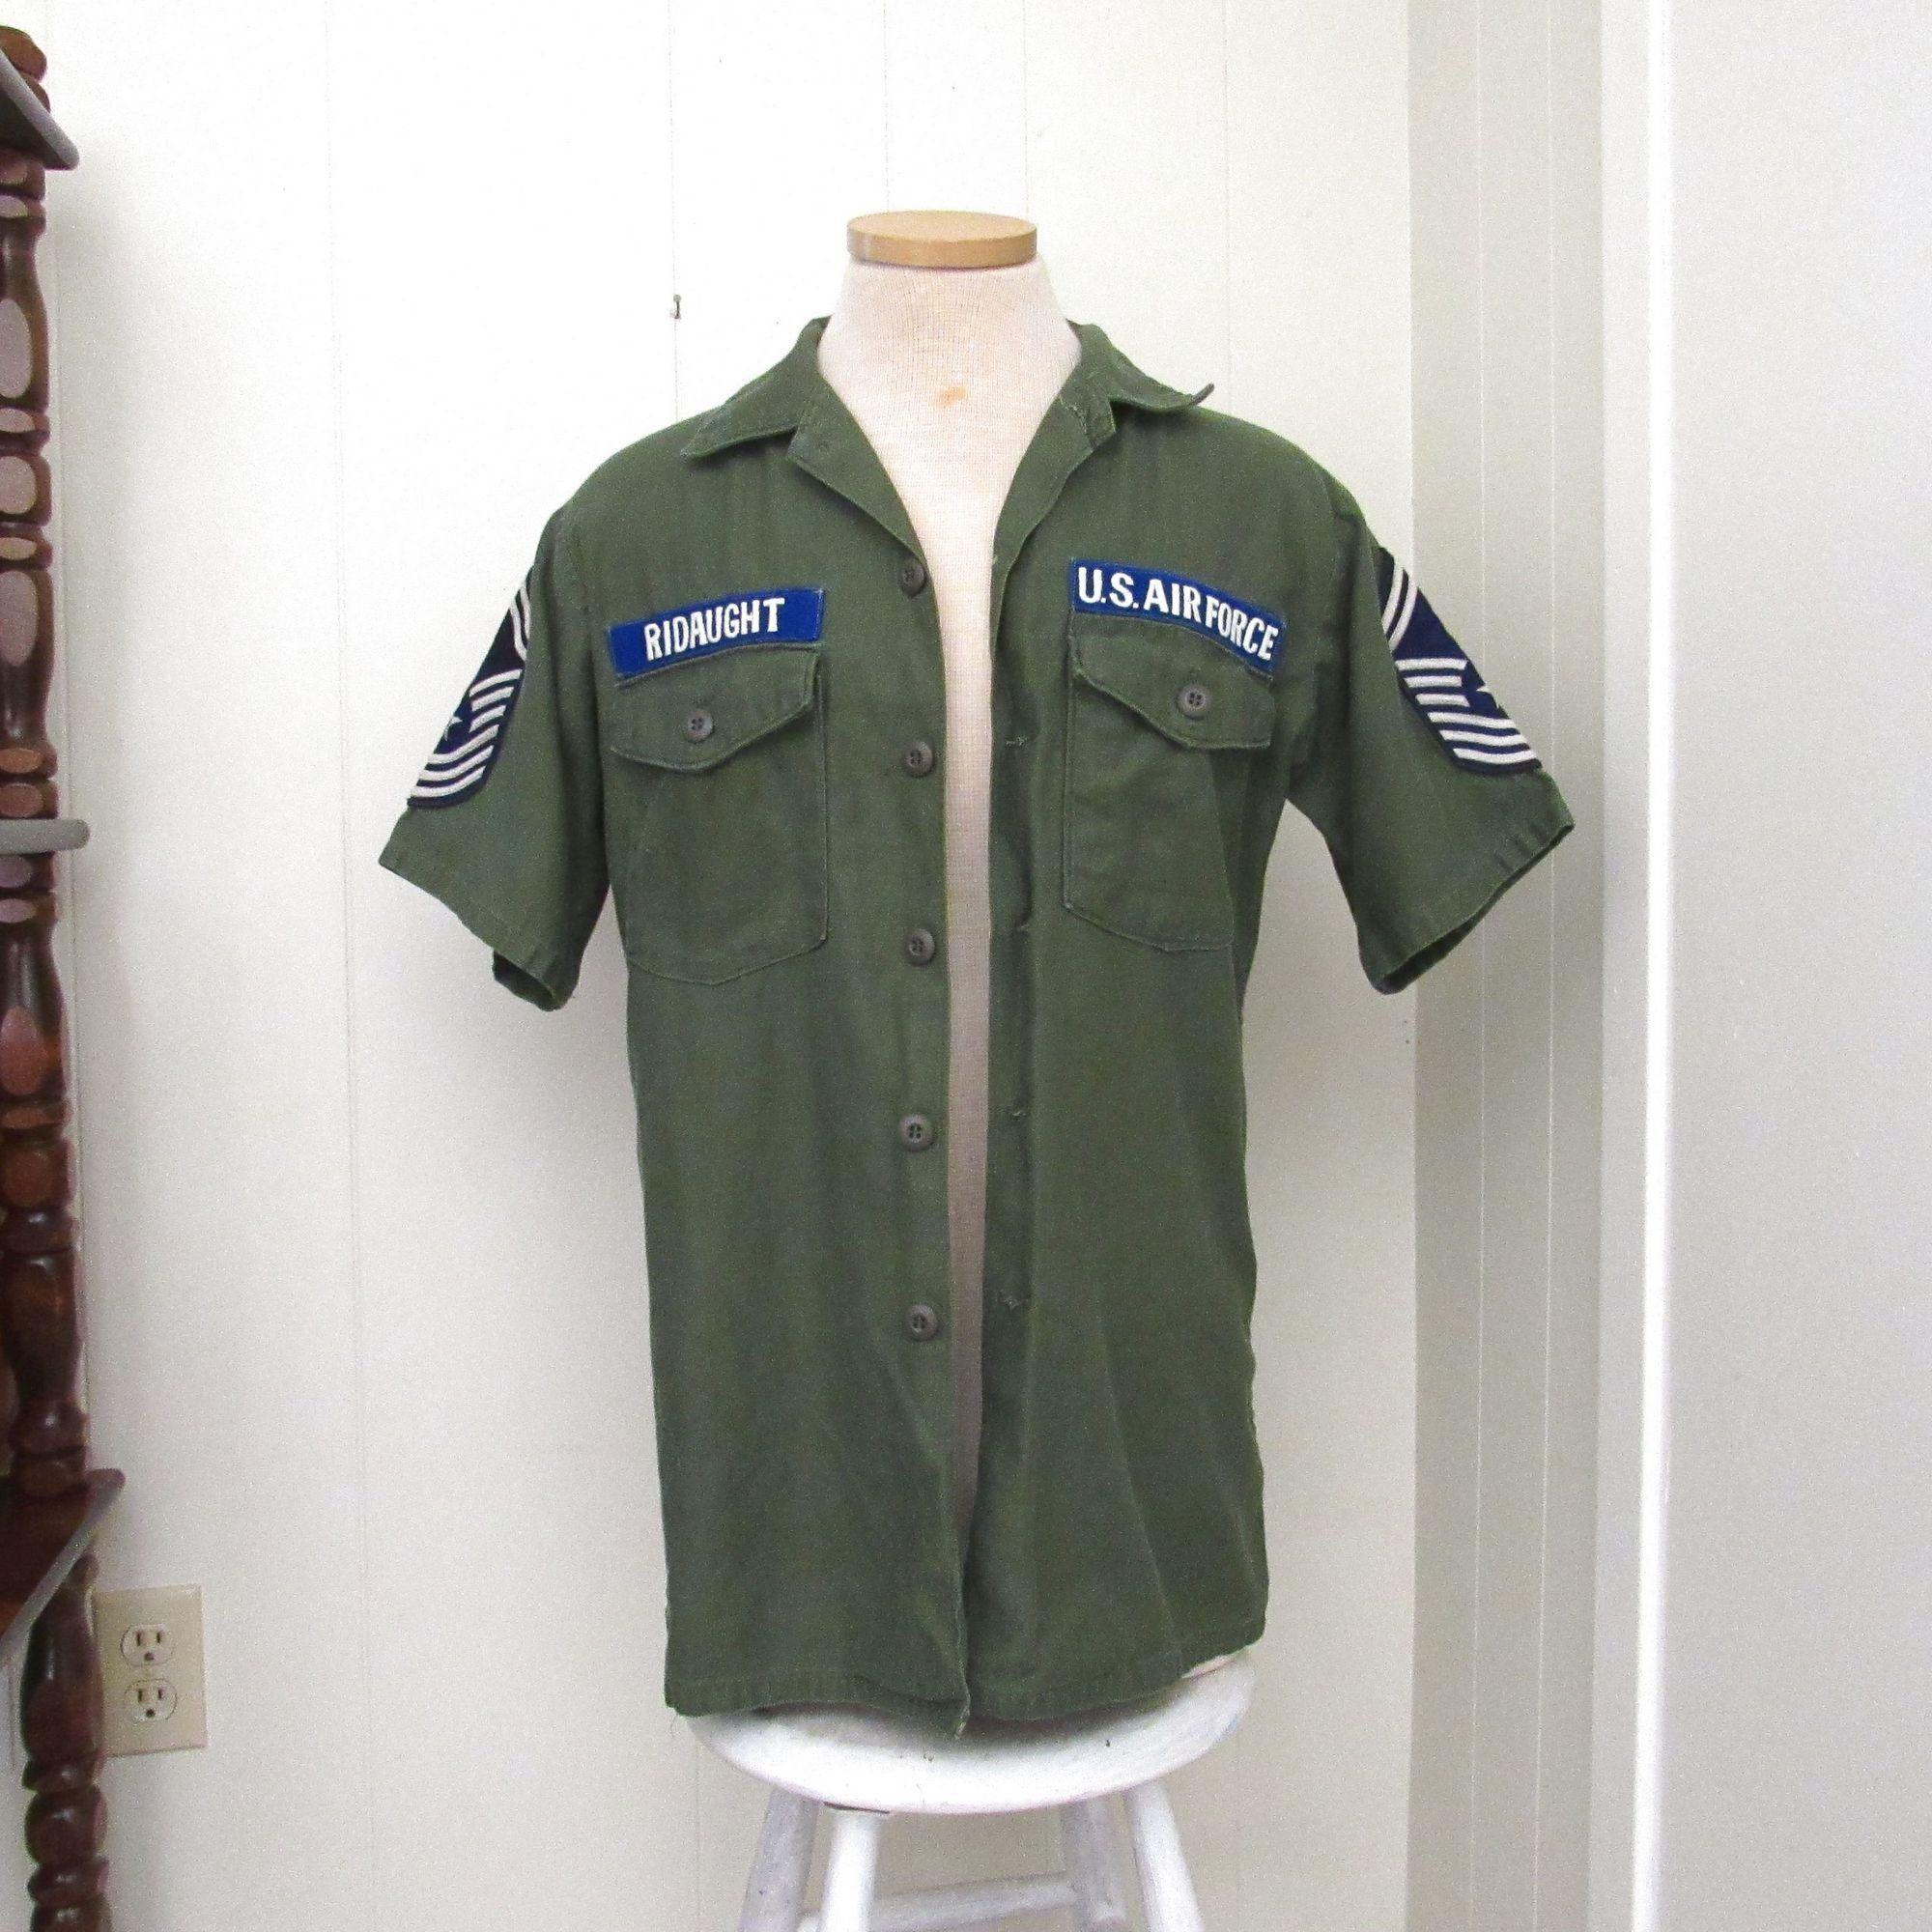 Vintage US Air Force Shirt Army Green Military Short